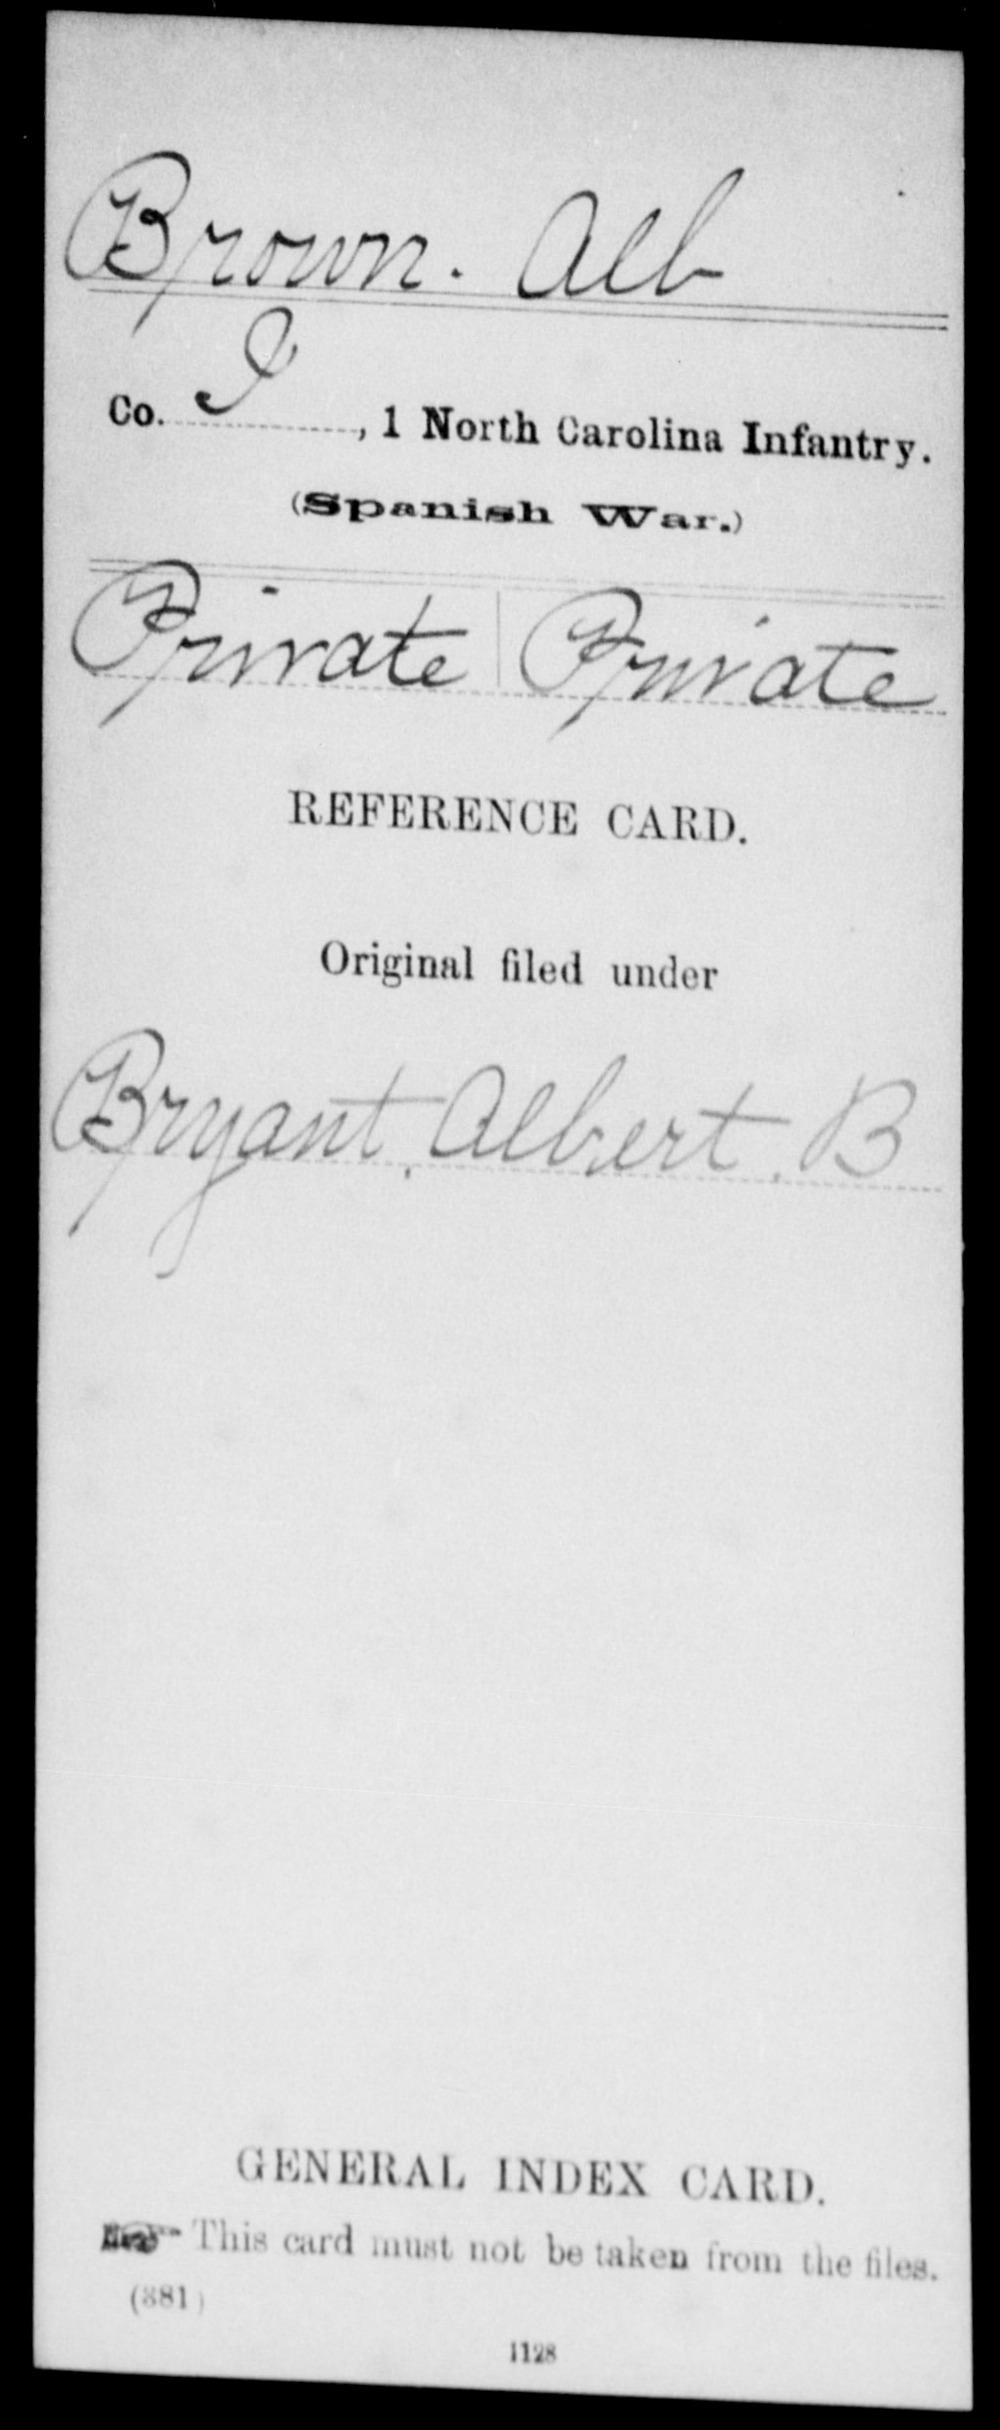 Brown, Alb - State: North Carolina - Regiment: 1 North Carolina Infantry, Company I